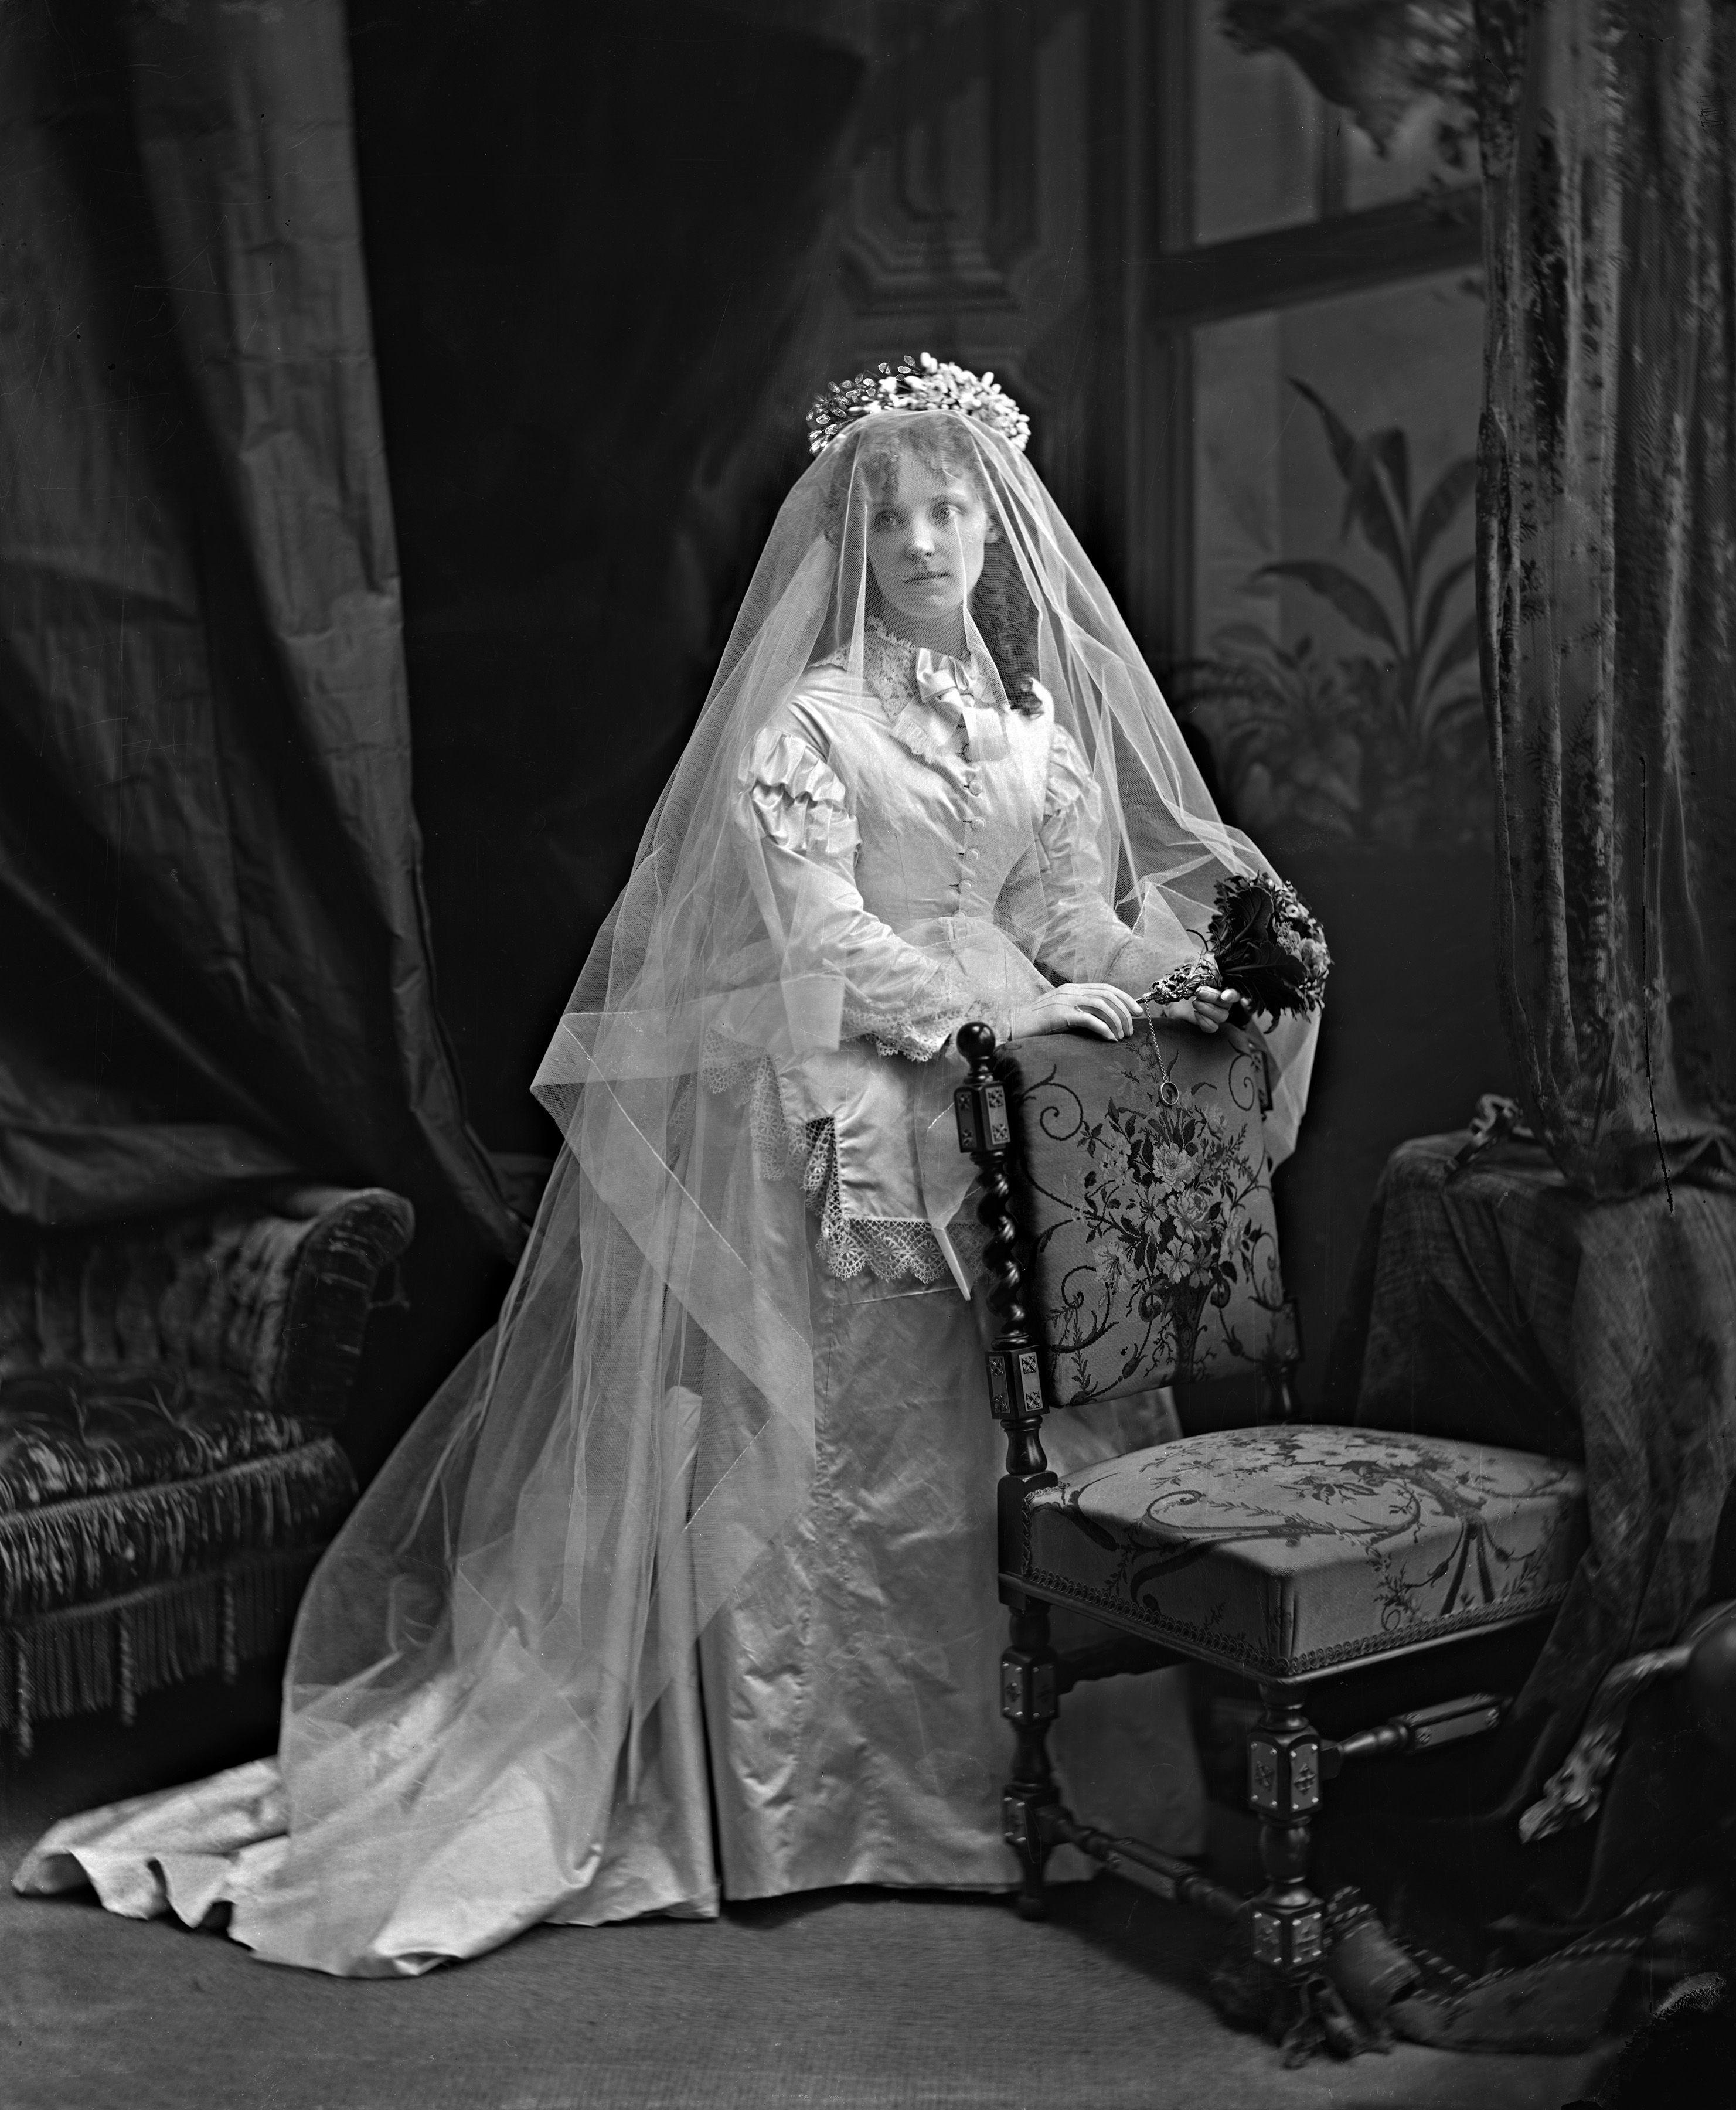 Wedding Gowns Montreal: Bridget Delaney, Mme John Mason, En Robe De Mariée